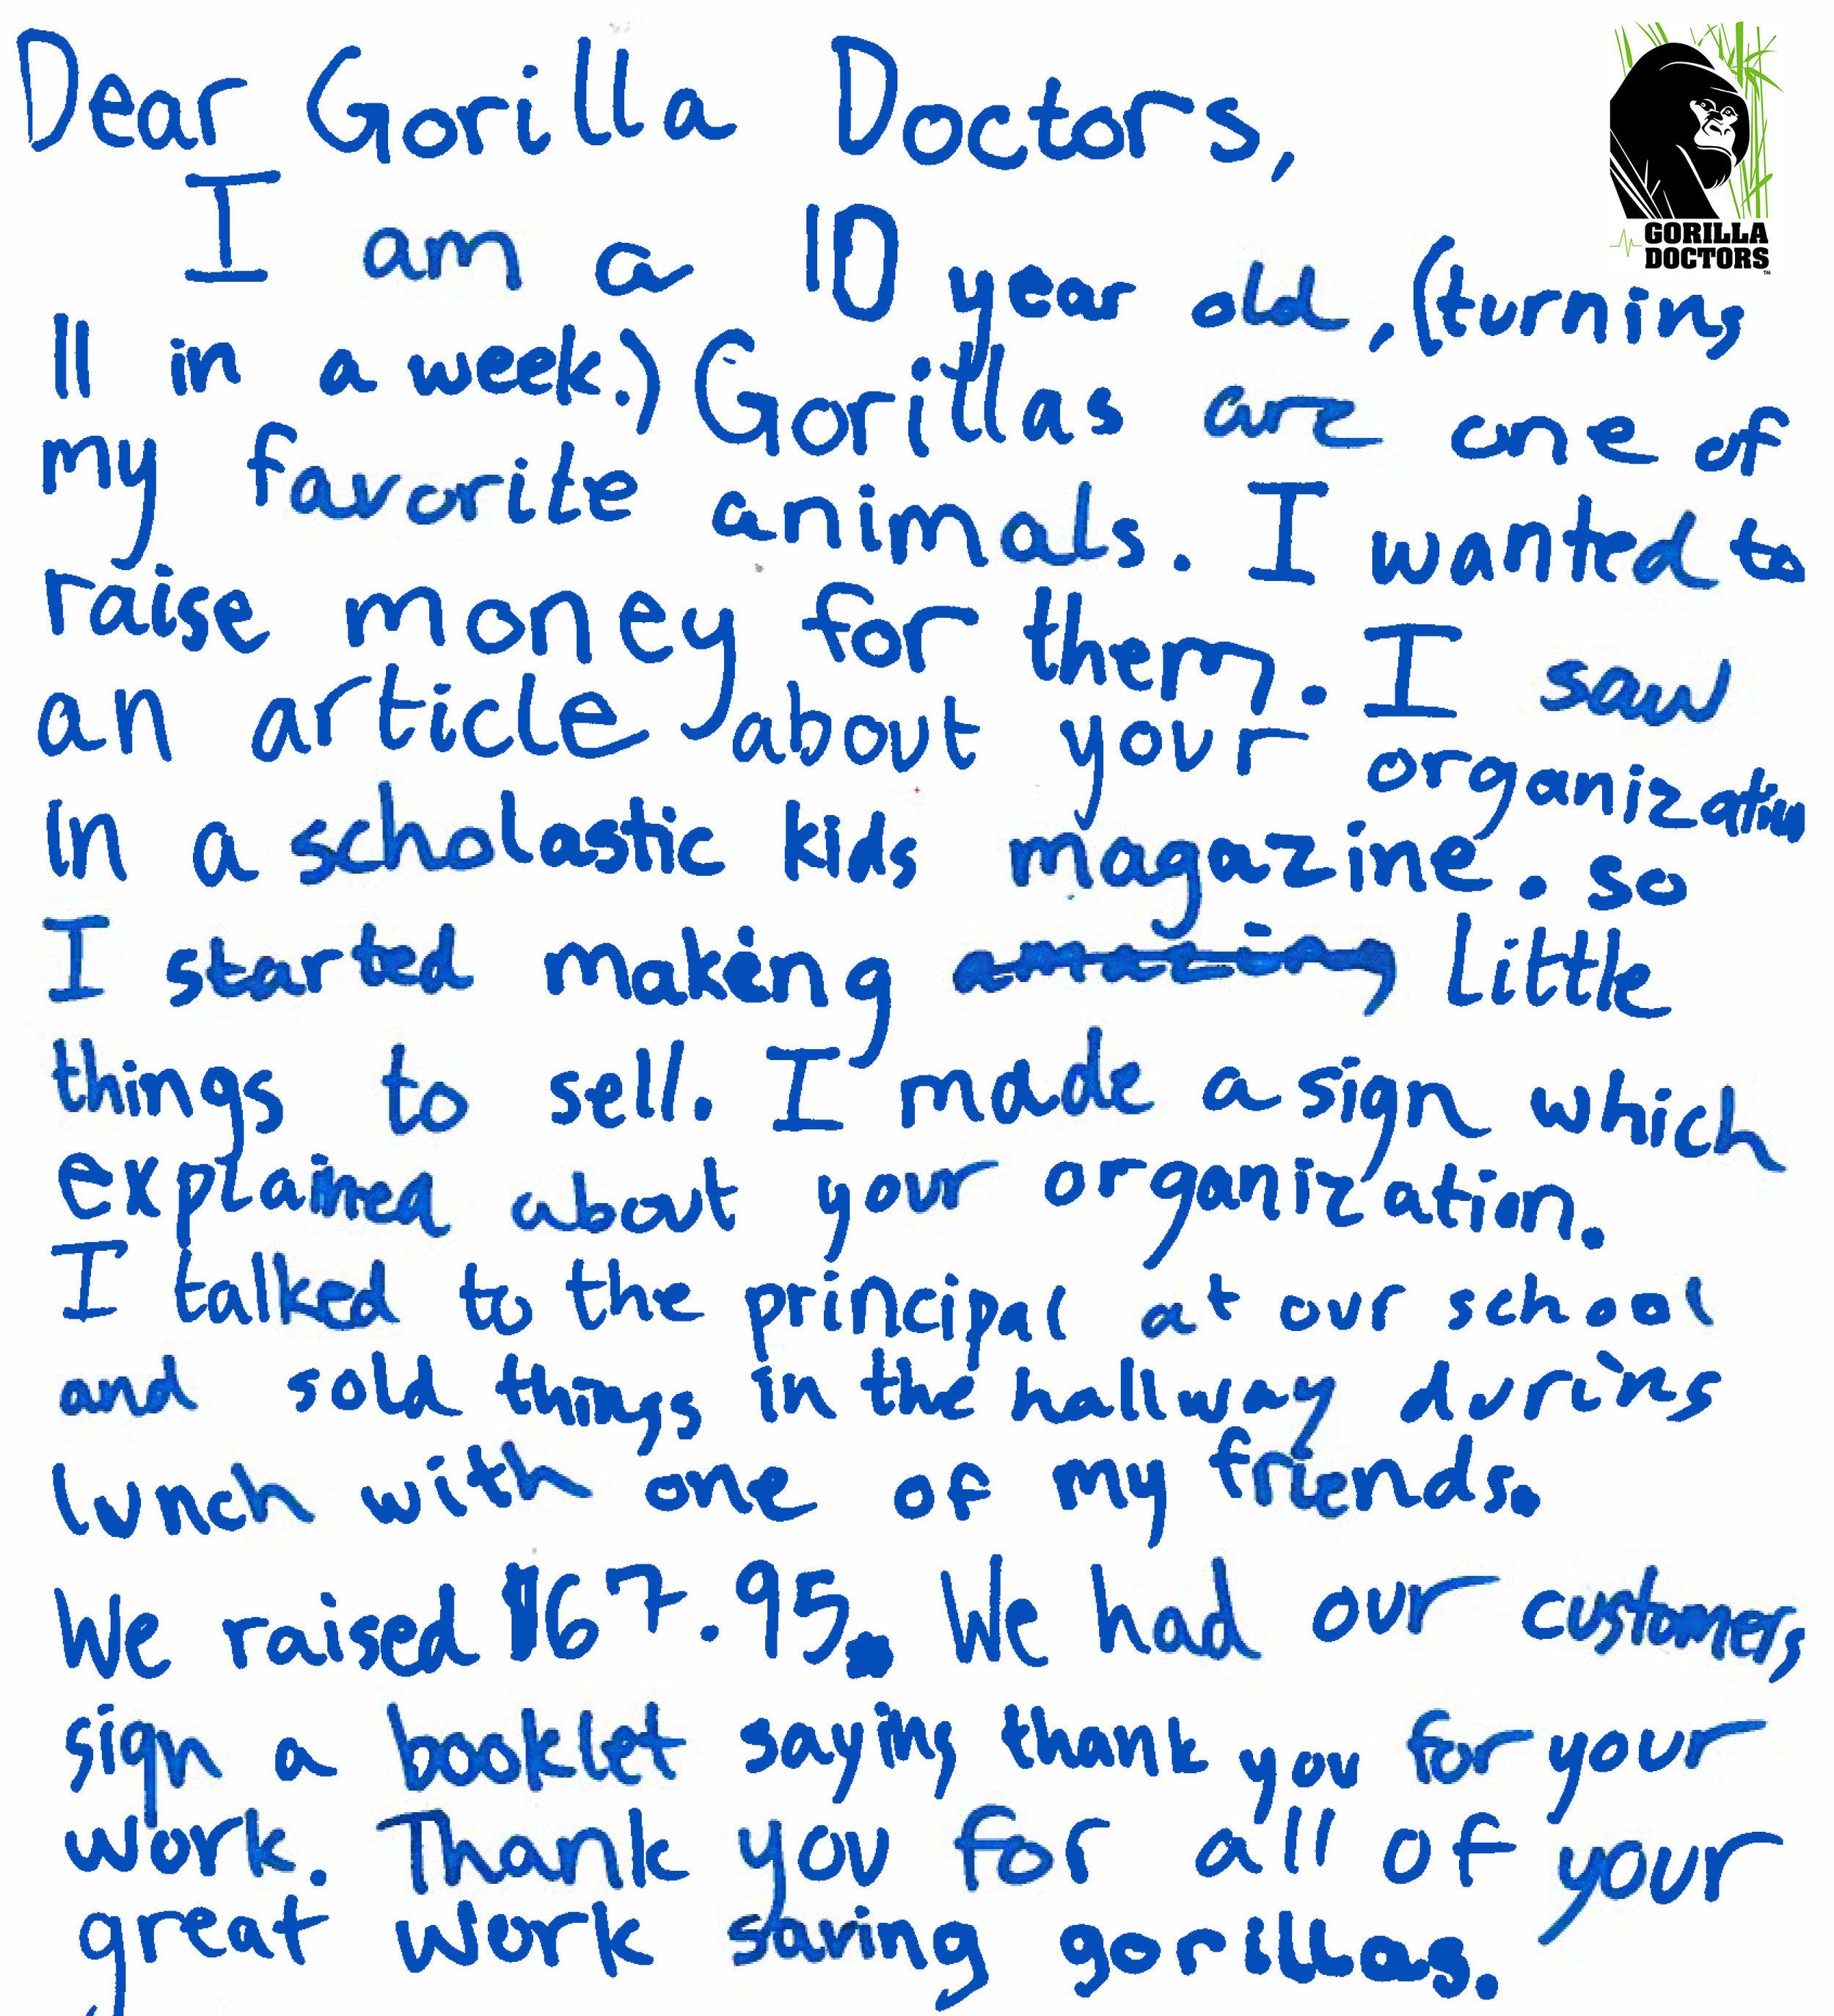 Raising money at school for gorillas.